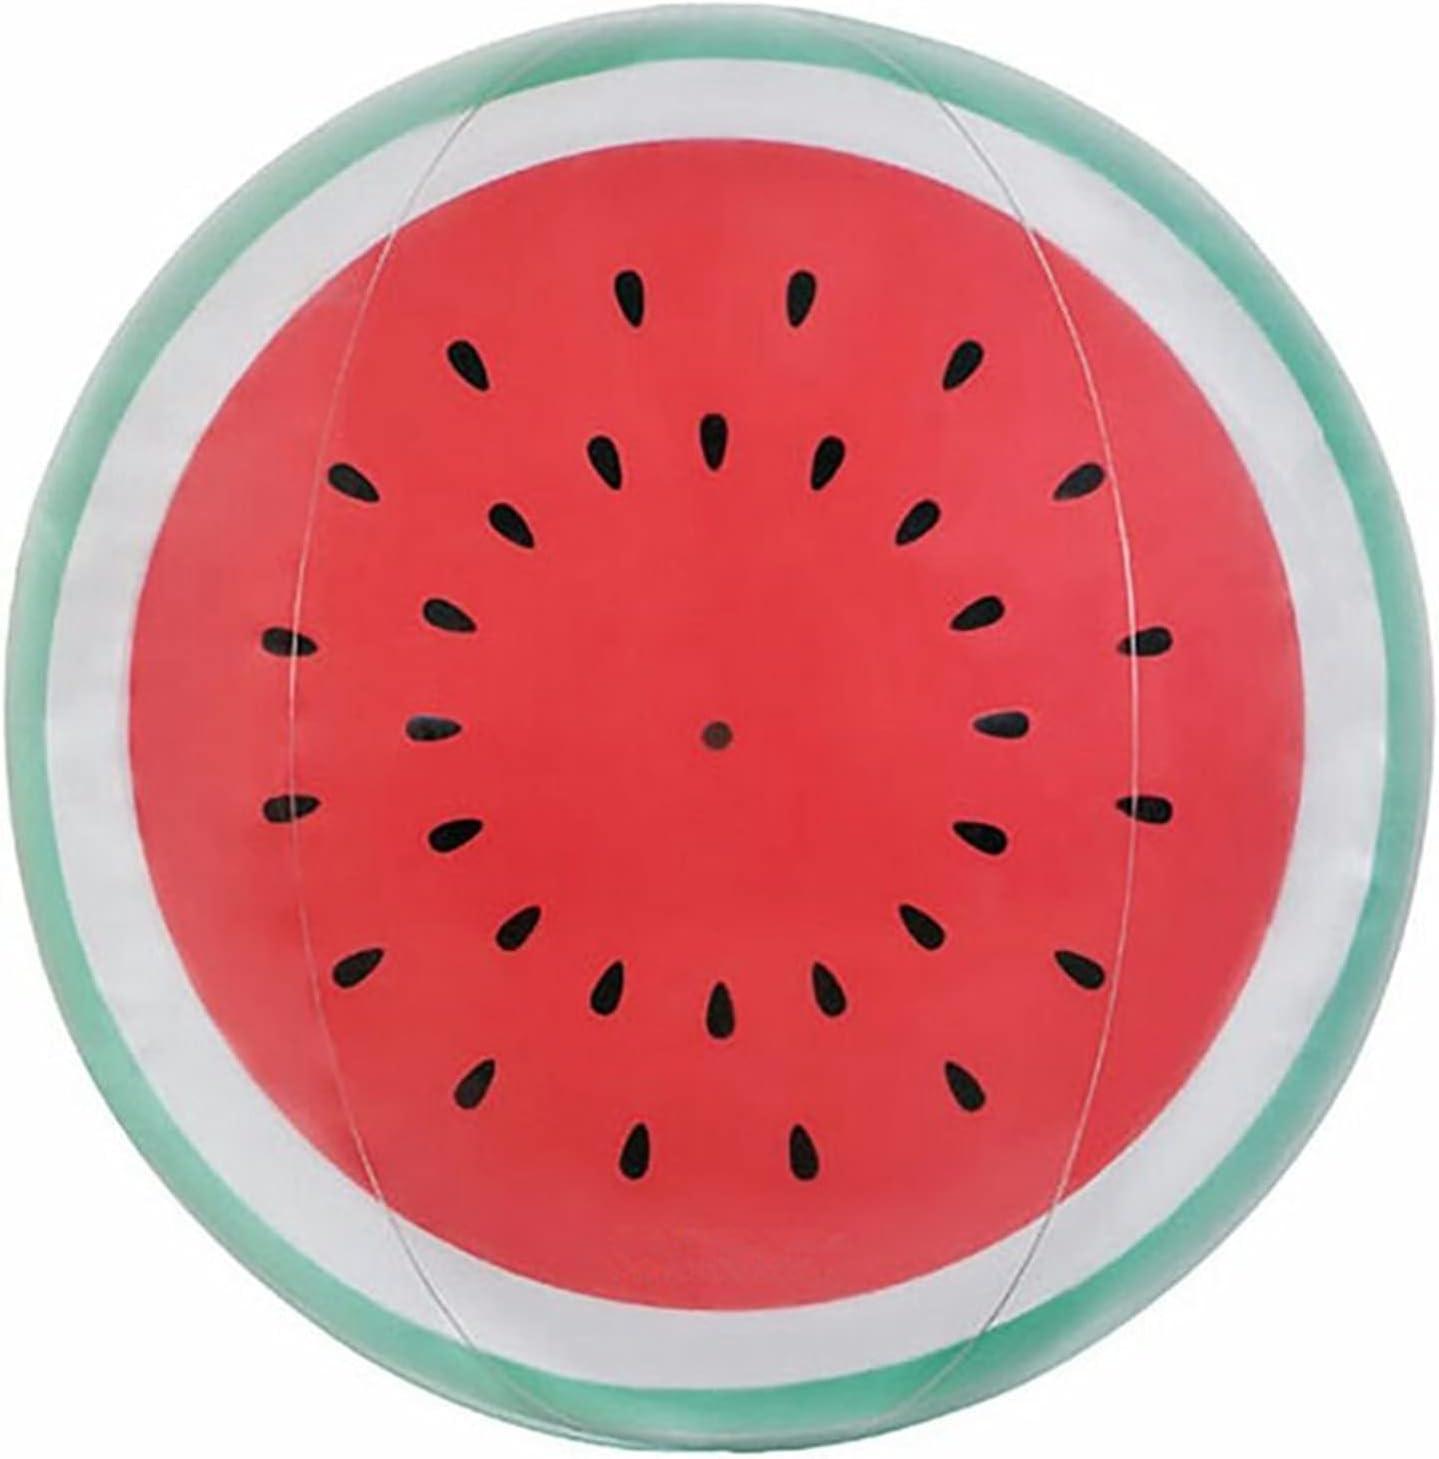 Eurobuy 3D Watermelon cheap Beach Ball Same day shipping Activity Summer Outdoor B